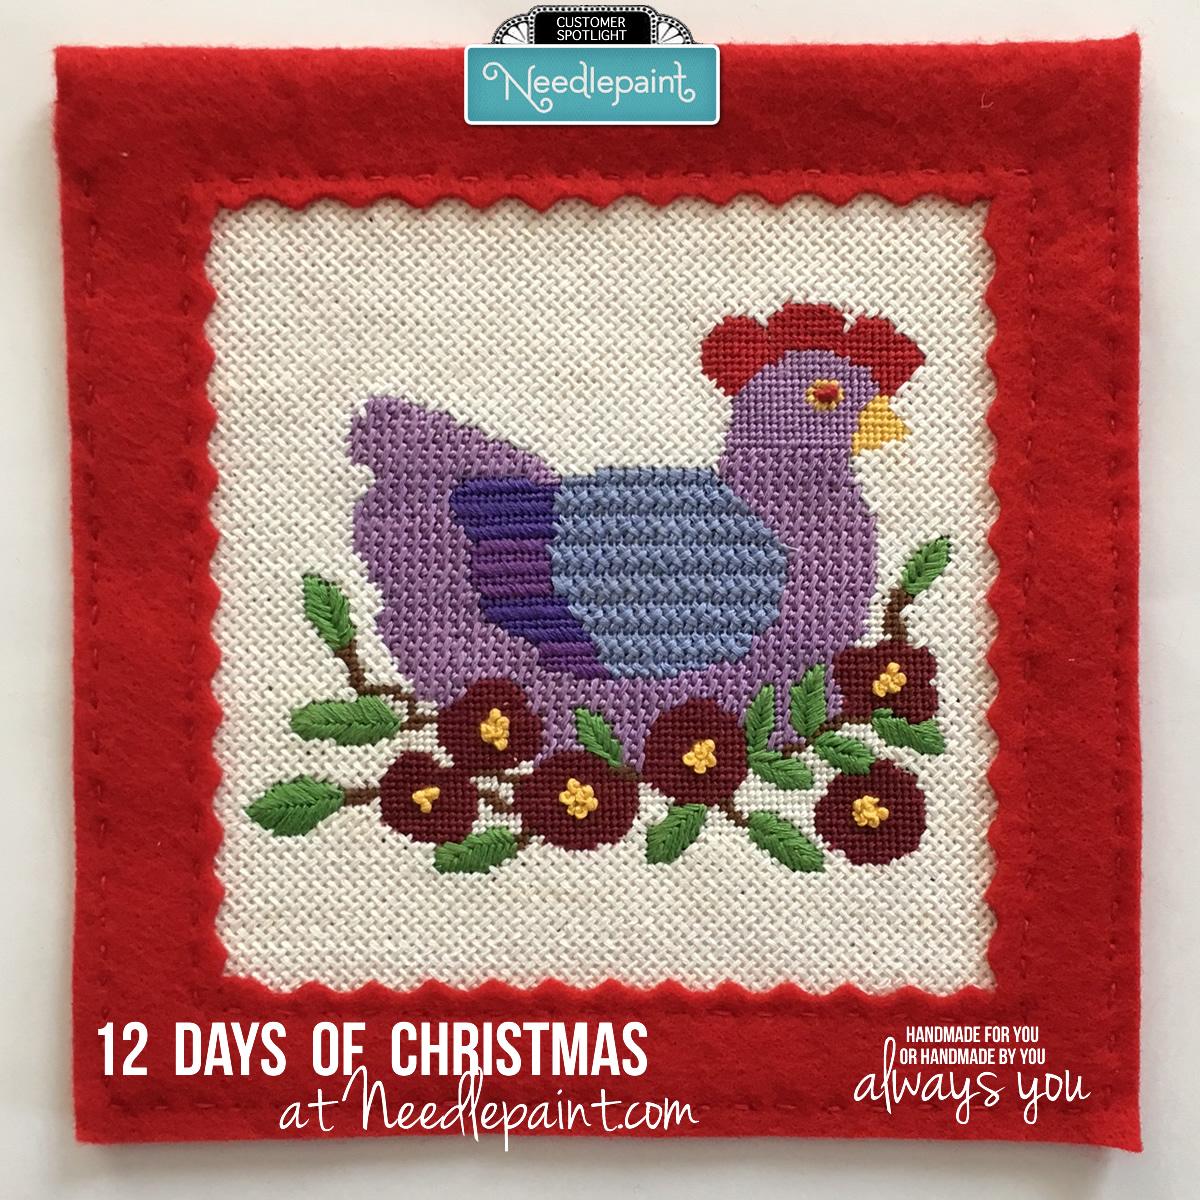 French Hen Needlepoint Kit with Stitch Chart